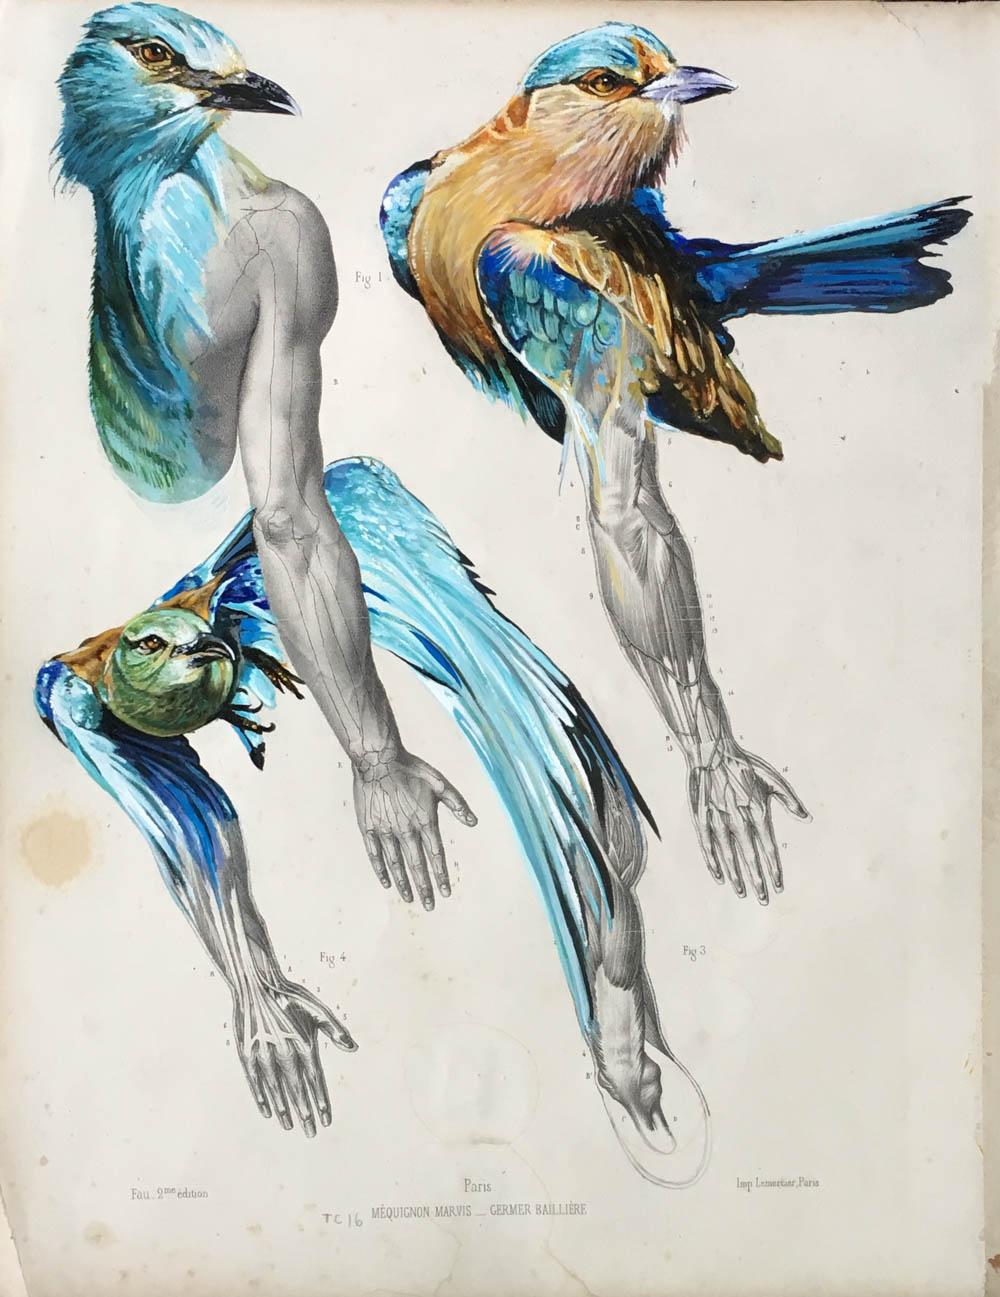 Artist Spotlight: Danish Painter Troels Carlsen